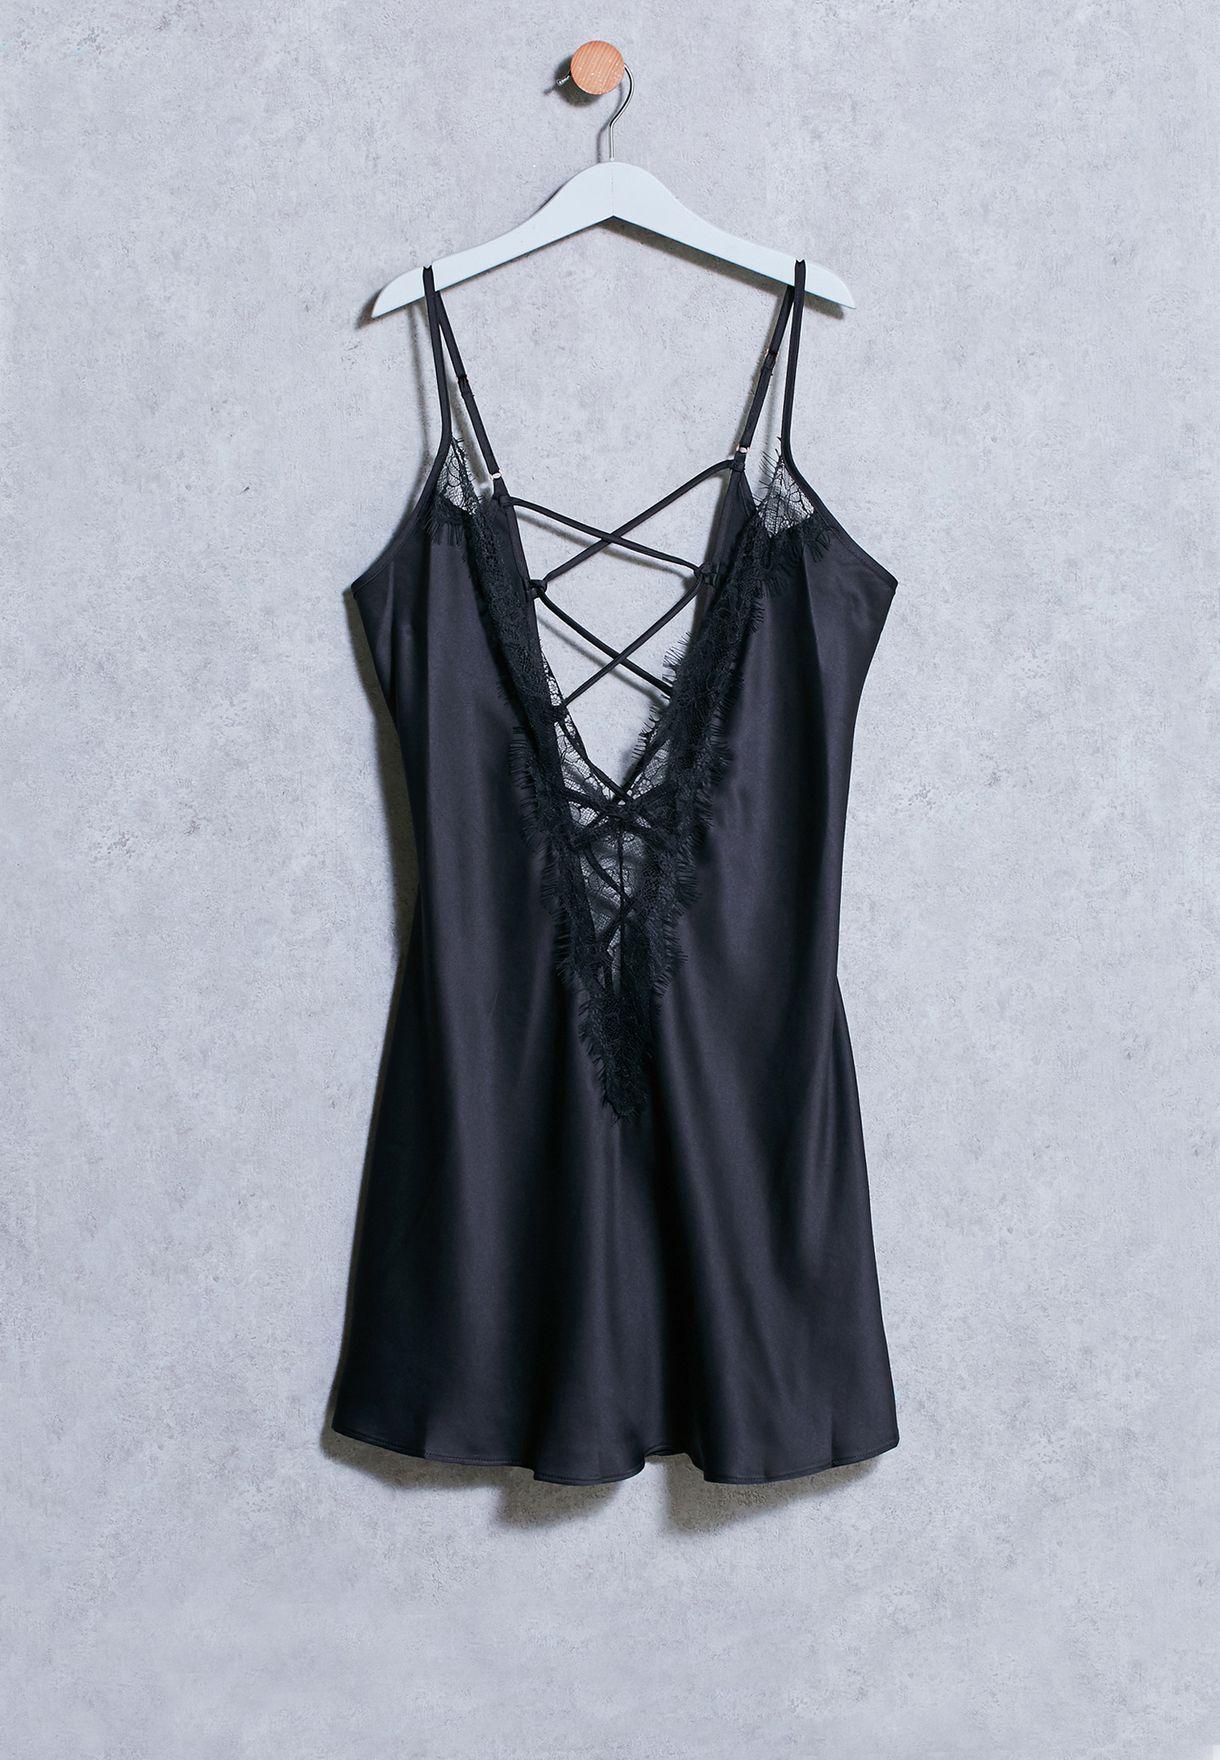 3a5124da936fb تسوق قميص نوم دانتيل ماركة آن سمرز لون أسود 02NWNSAS1151 في جميع ...